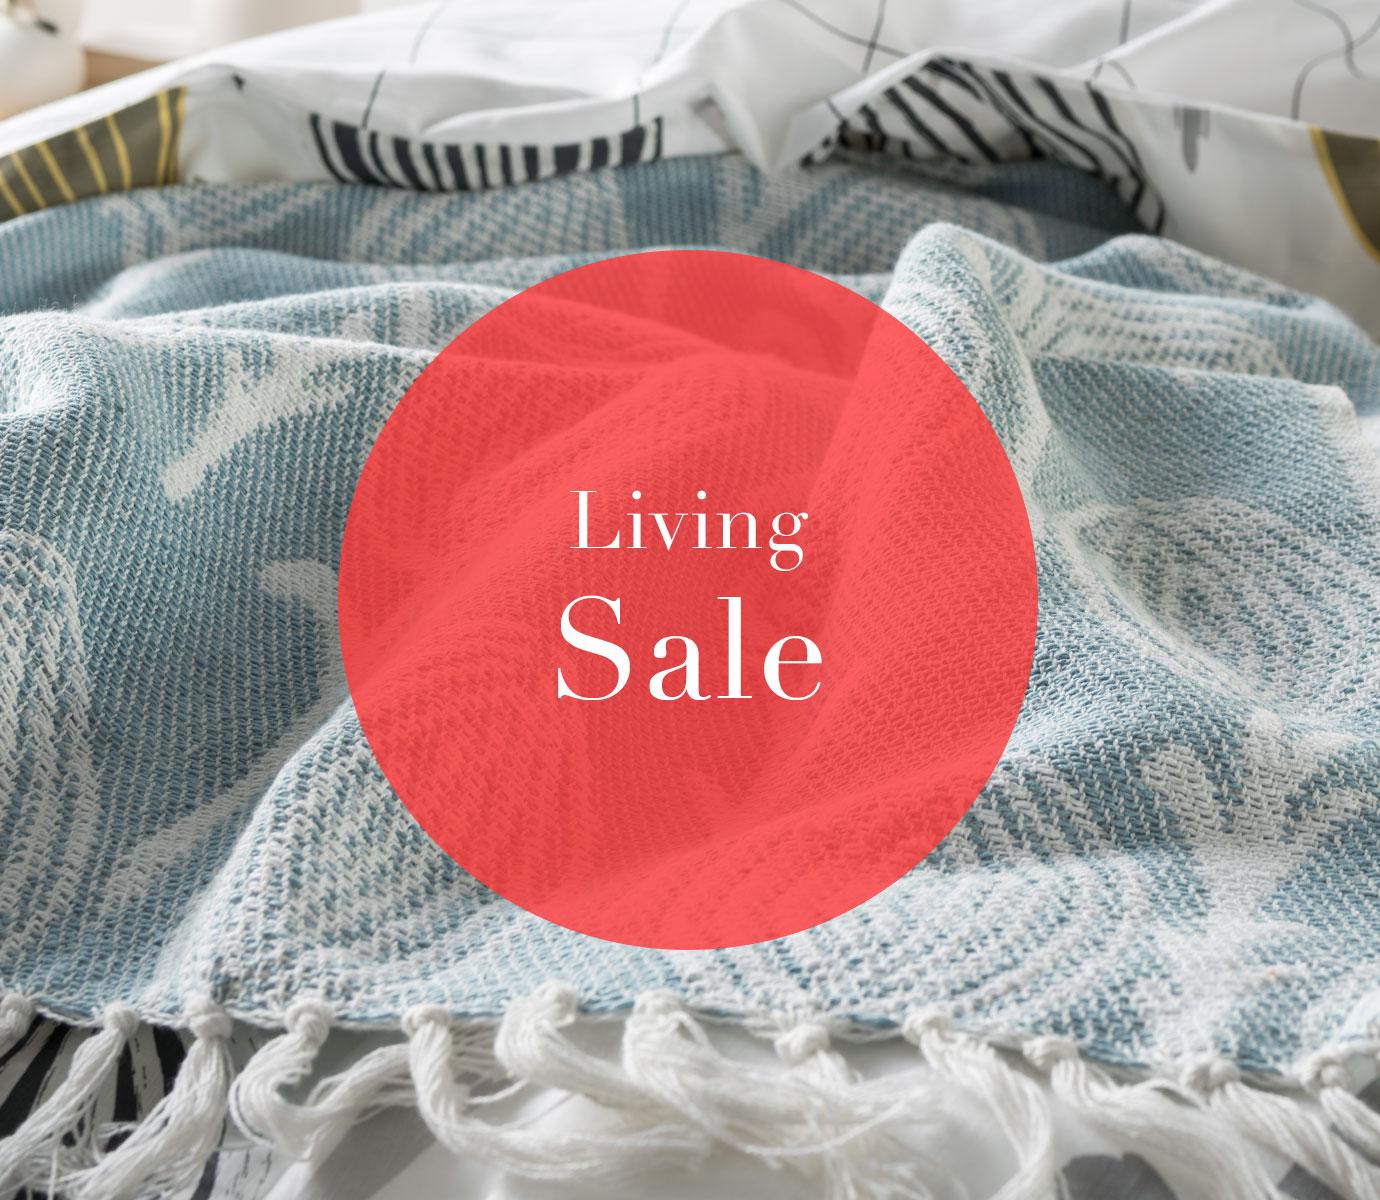 Living Sale